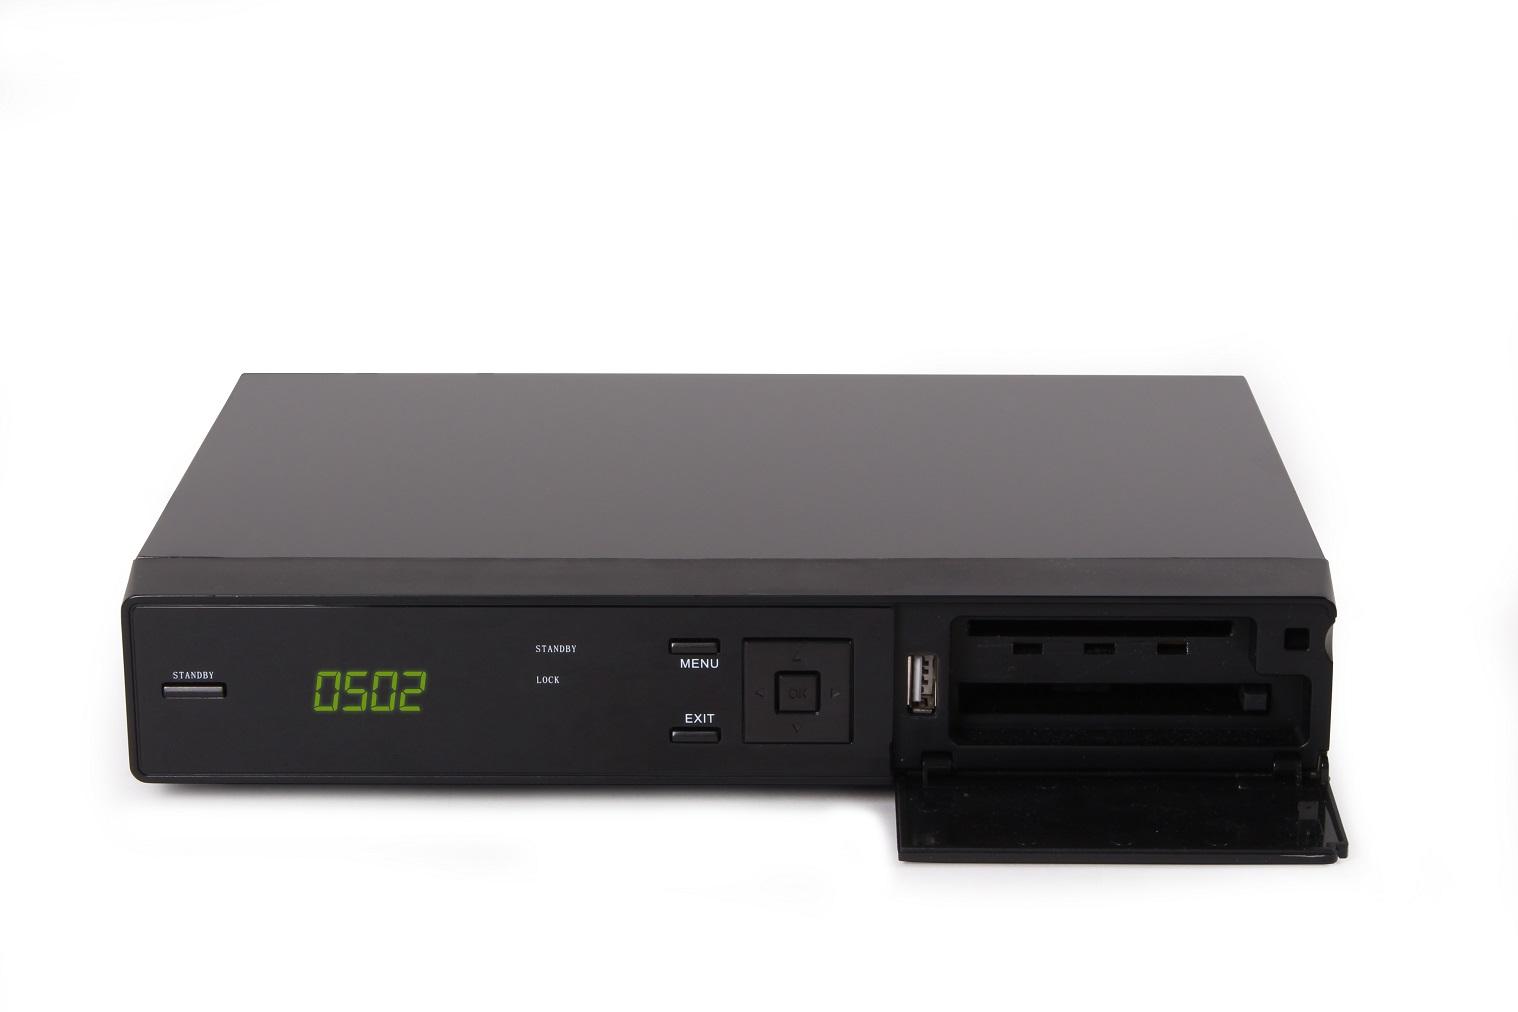 c1d57b2c8 Satelitný prijímač DVB-S/S2/T2/C Opticum AX 502 Combo | SORTEC ...